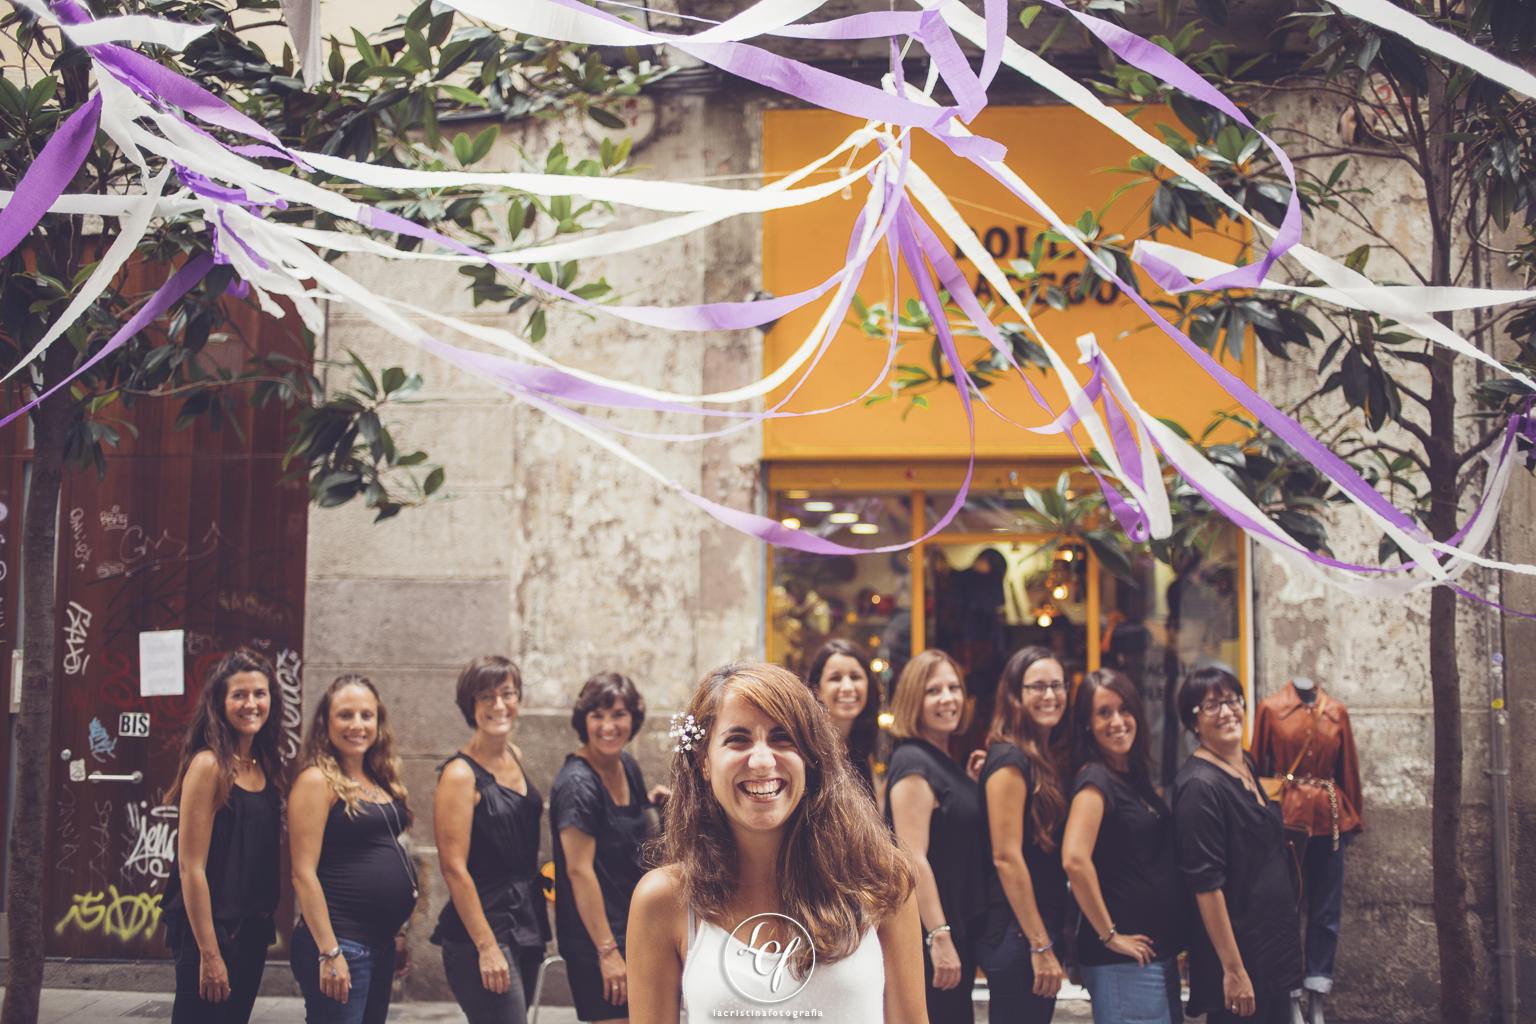 reportaje despedida de soltera barcelona :: fotografías despedida de soltera :: reportaje barcelona